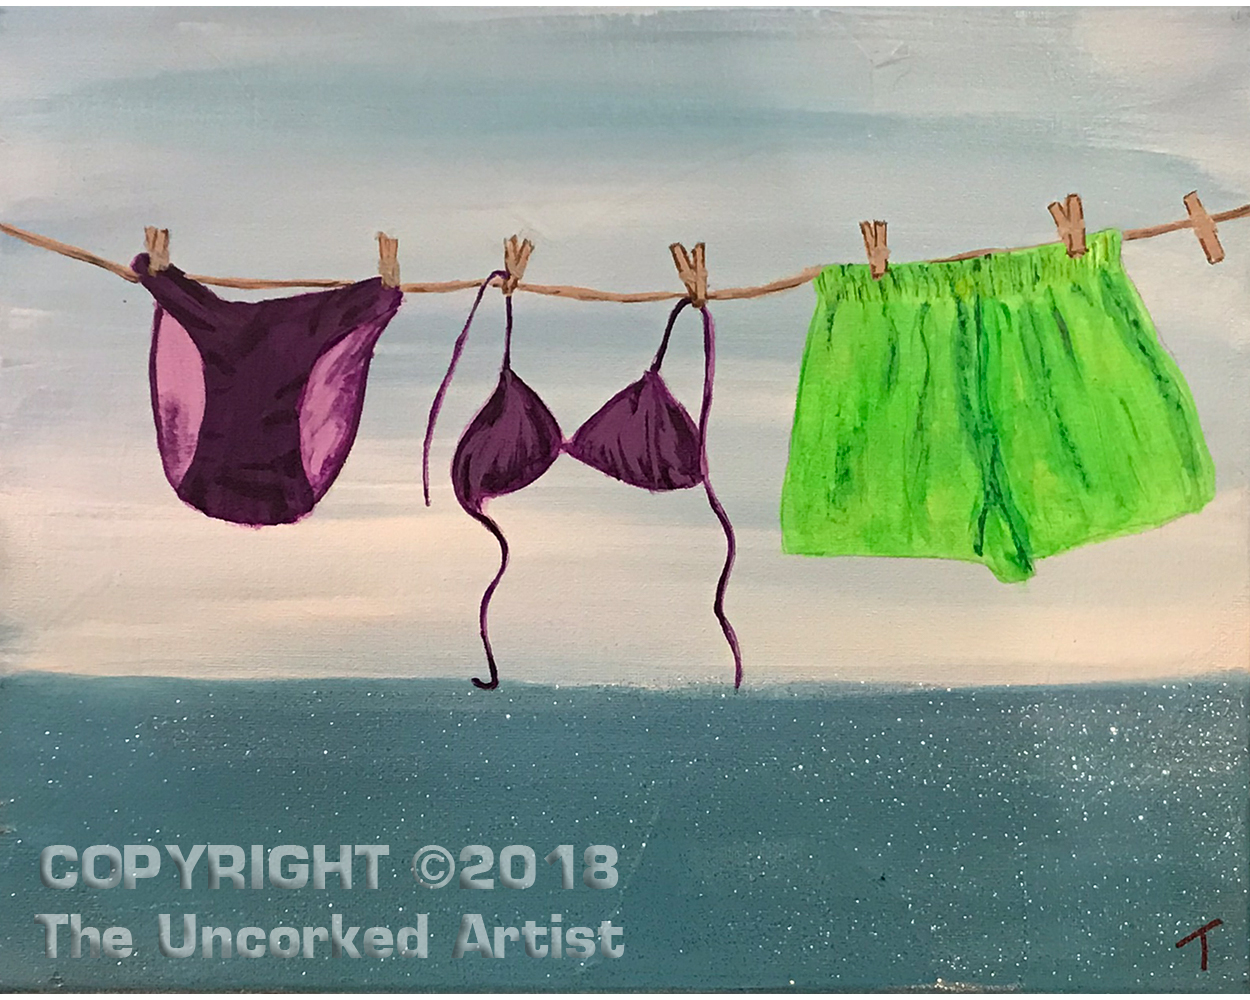 Summer Swim Suits (#503) • Created by Tara • 11×14 • Tier 3